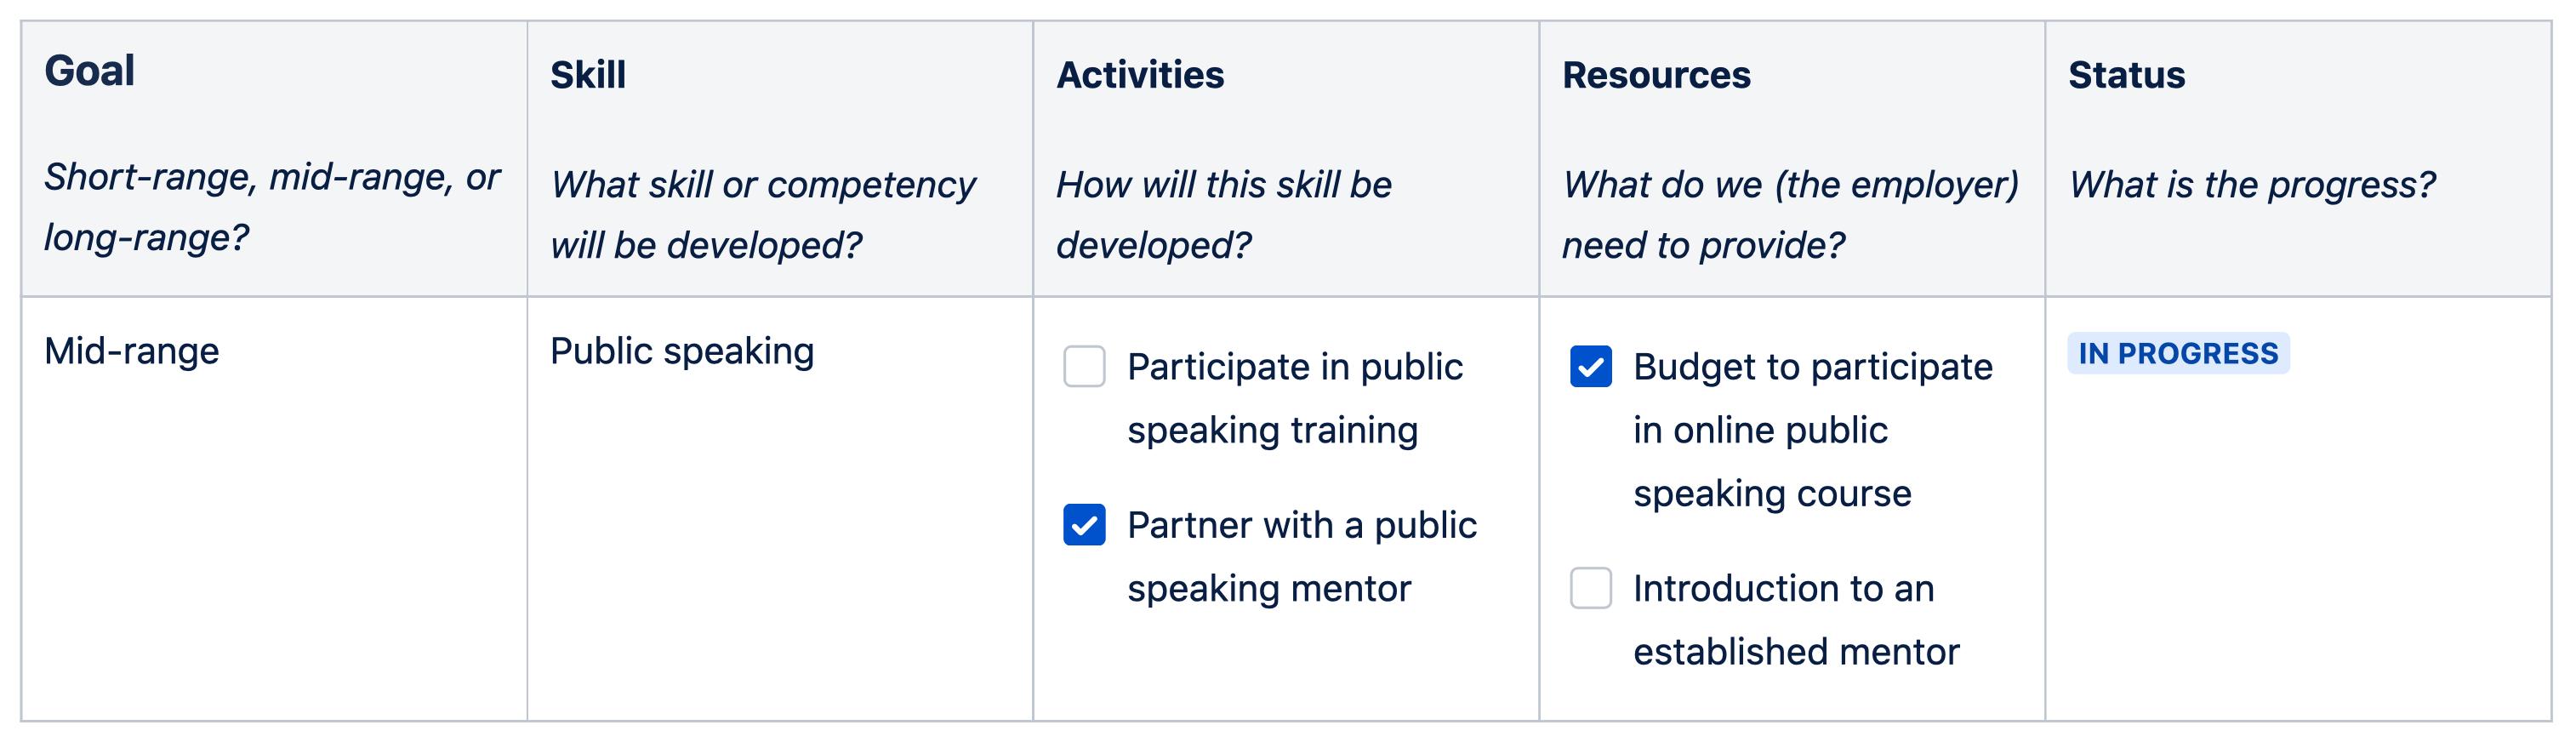 Employee development plan chart